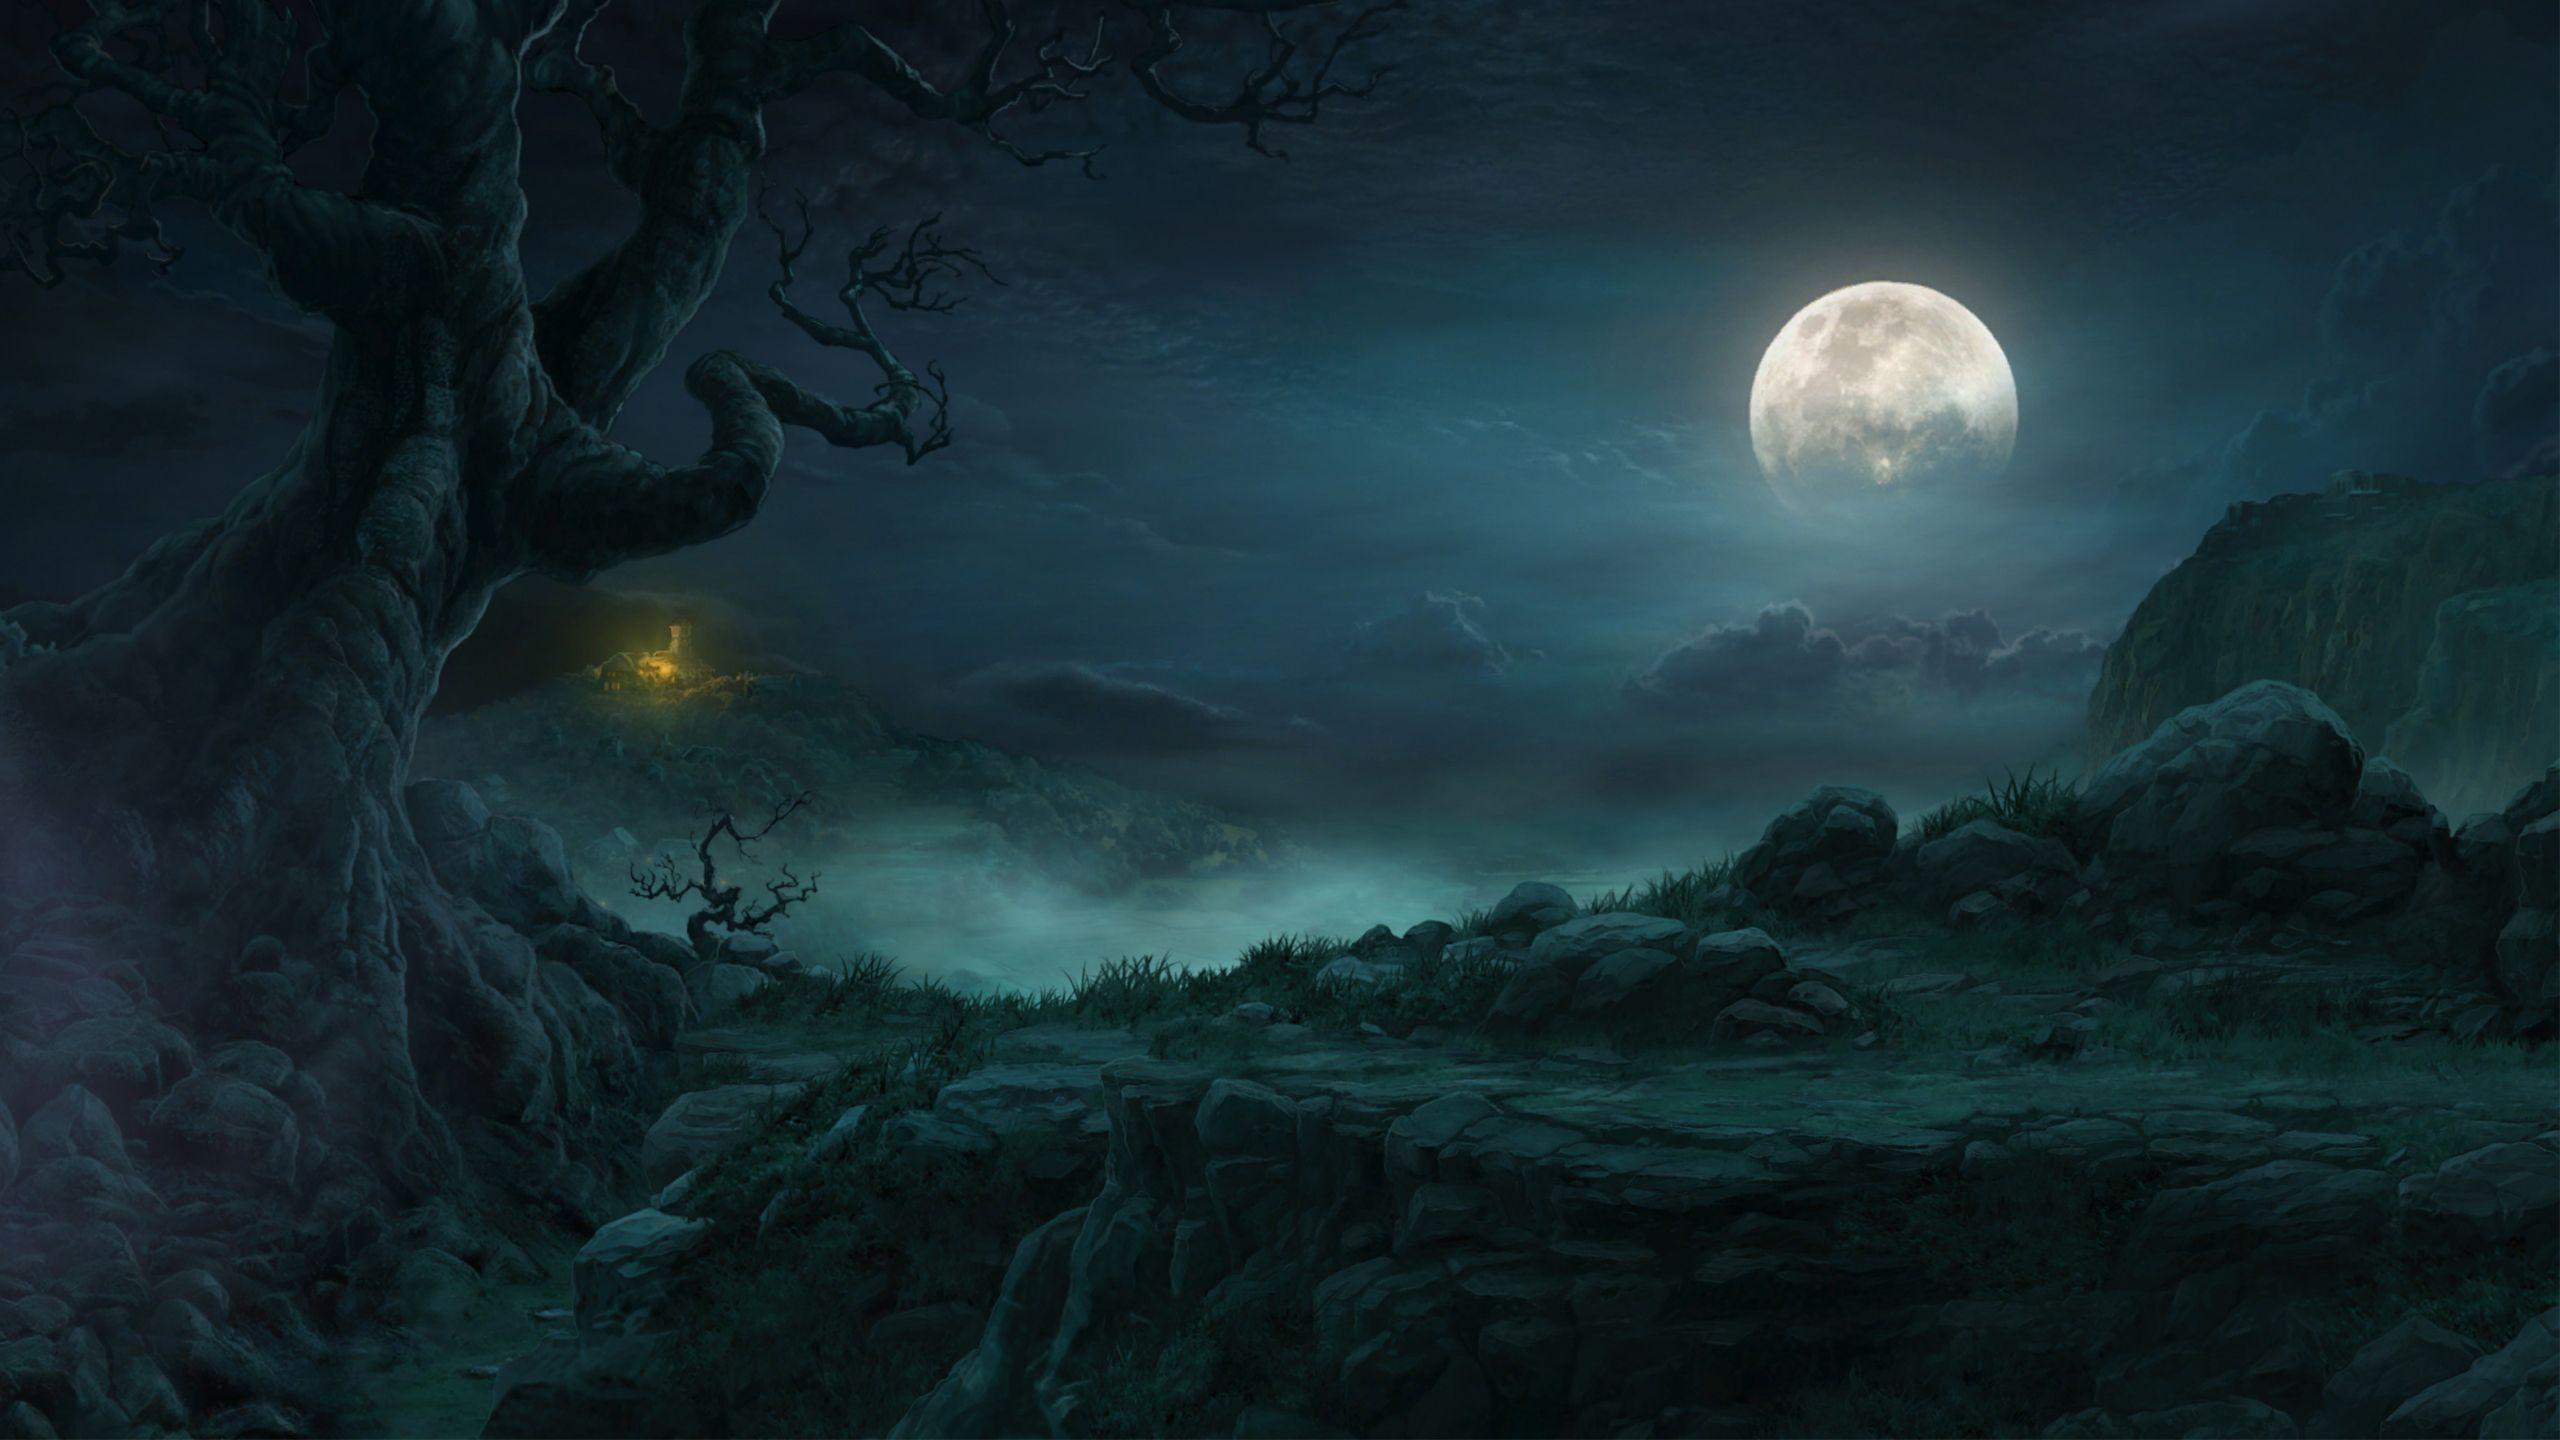 Fantasy Landscapes Fantasy Landscape Night Moon Rocks Tree Hut The Clouds Games Wallpaper Fantasy Landscape Night Landscape Fantasy